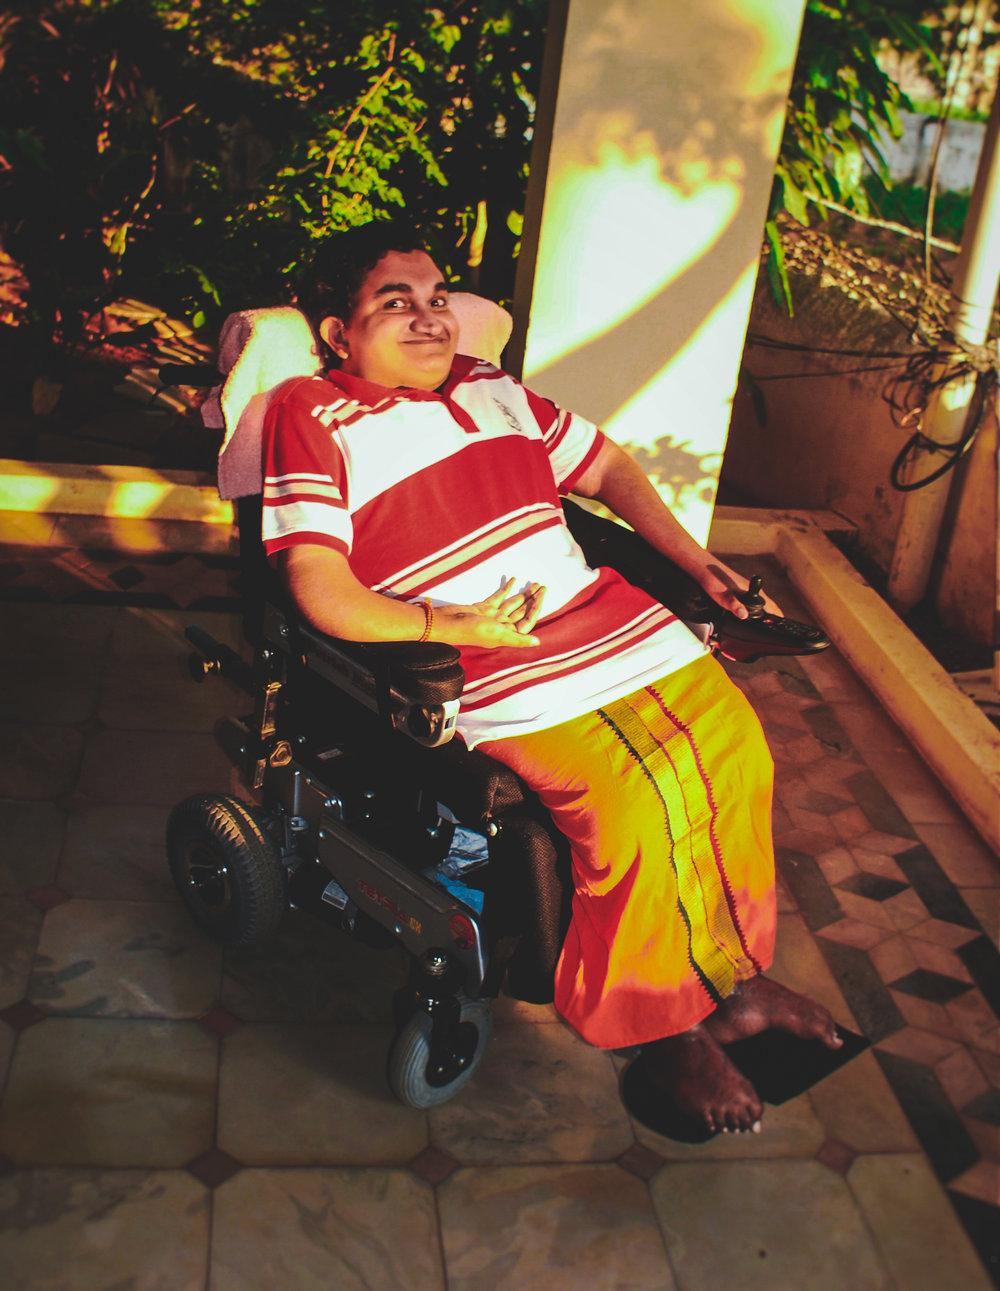 Compassionate Sai Kaustuv Dasgupta